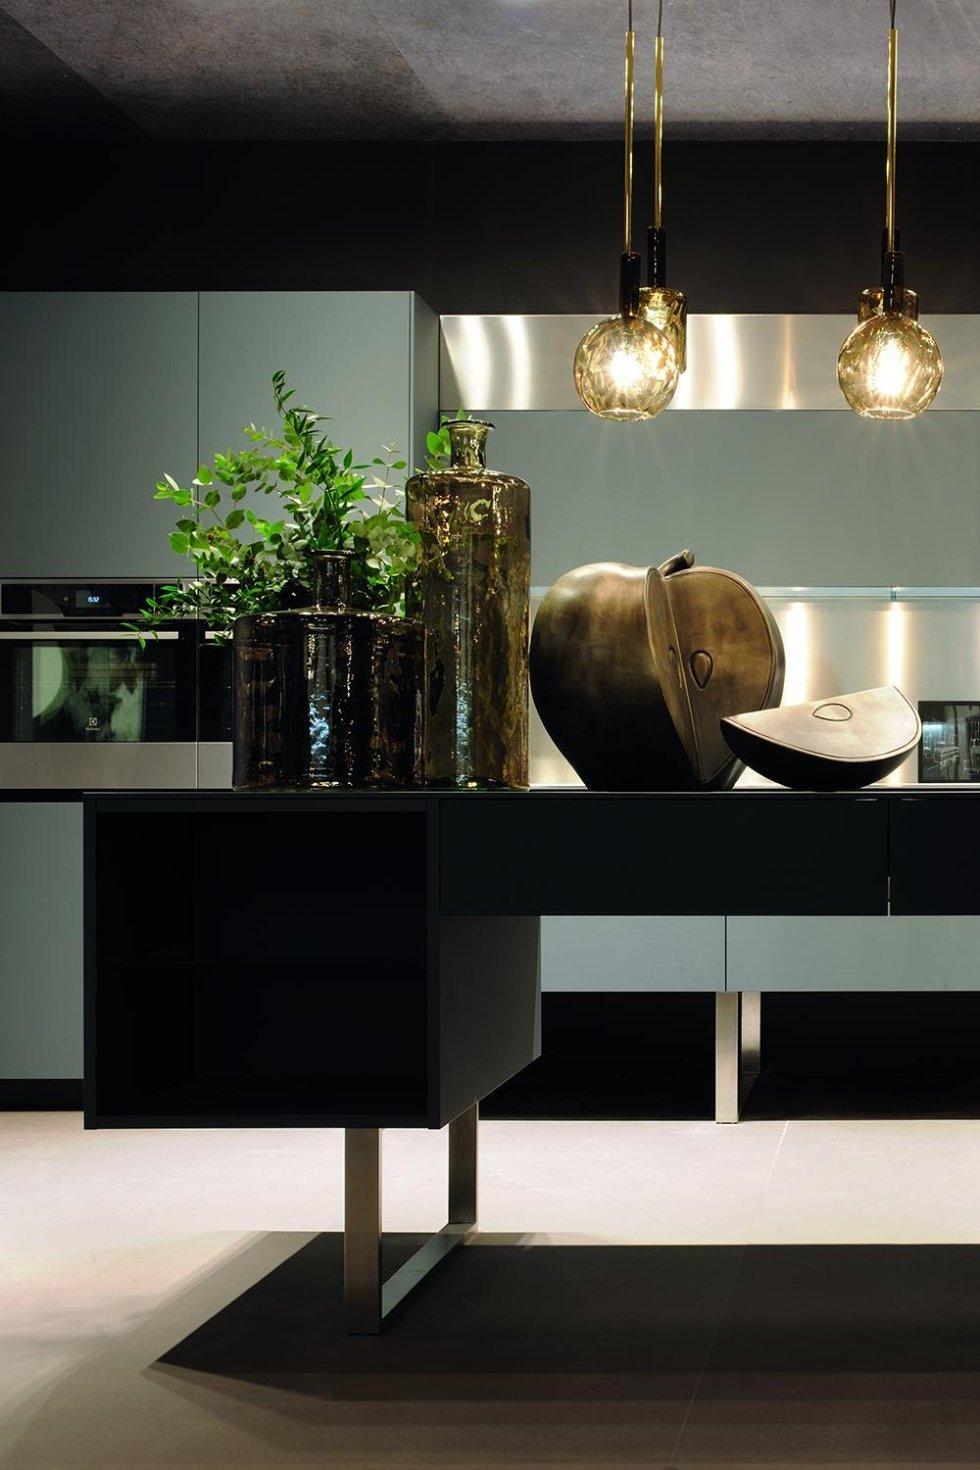 cucina stile moderno